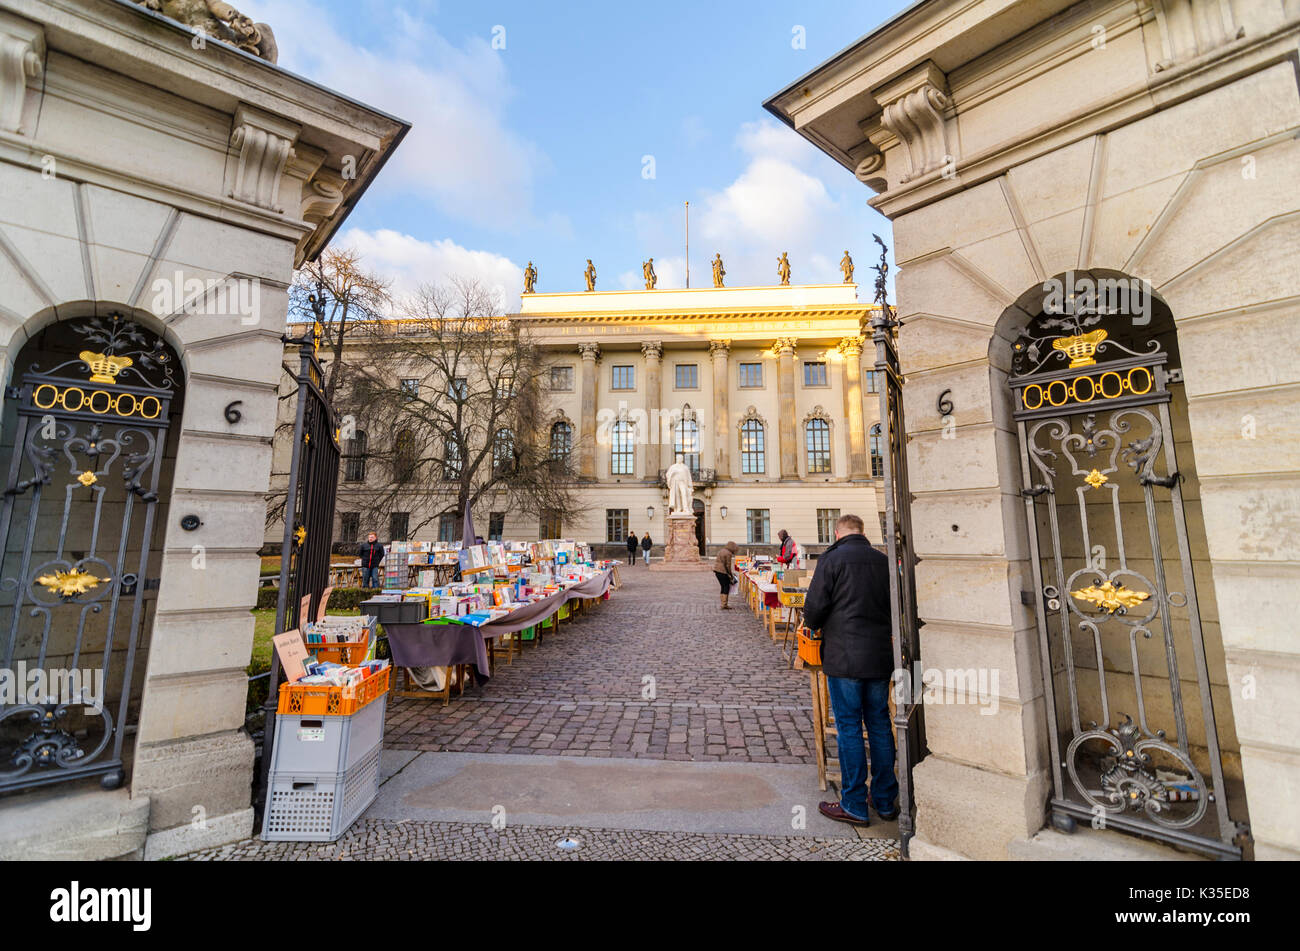 Book market outside Humboldt-Universität Humboldt University, Unter den Linden, Berlin, Germany - Stock Image